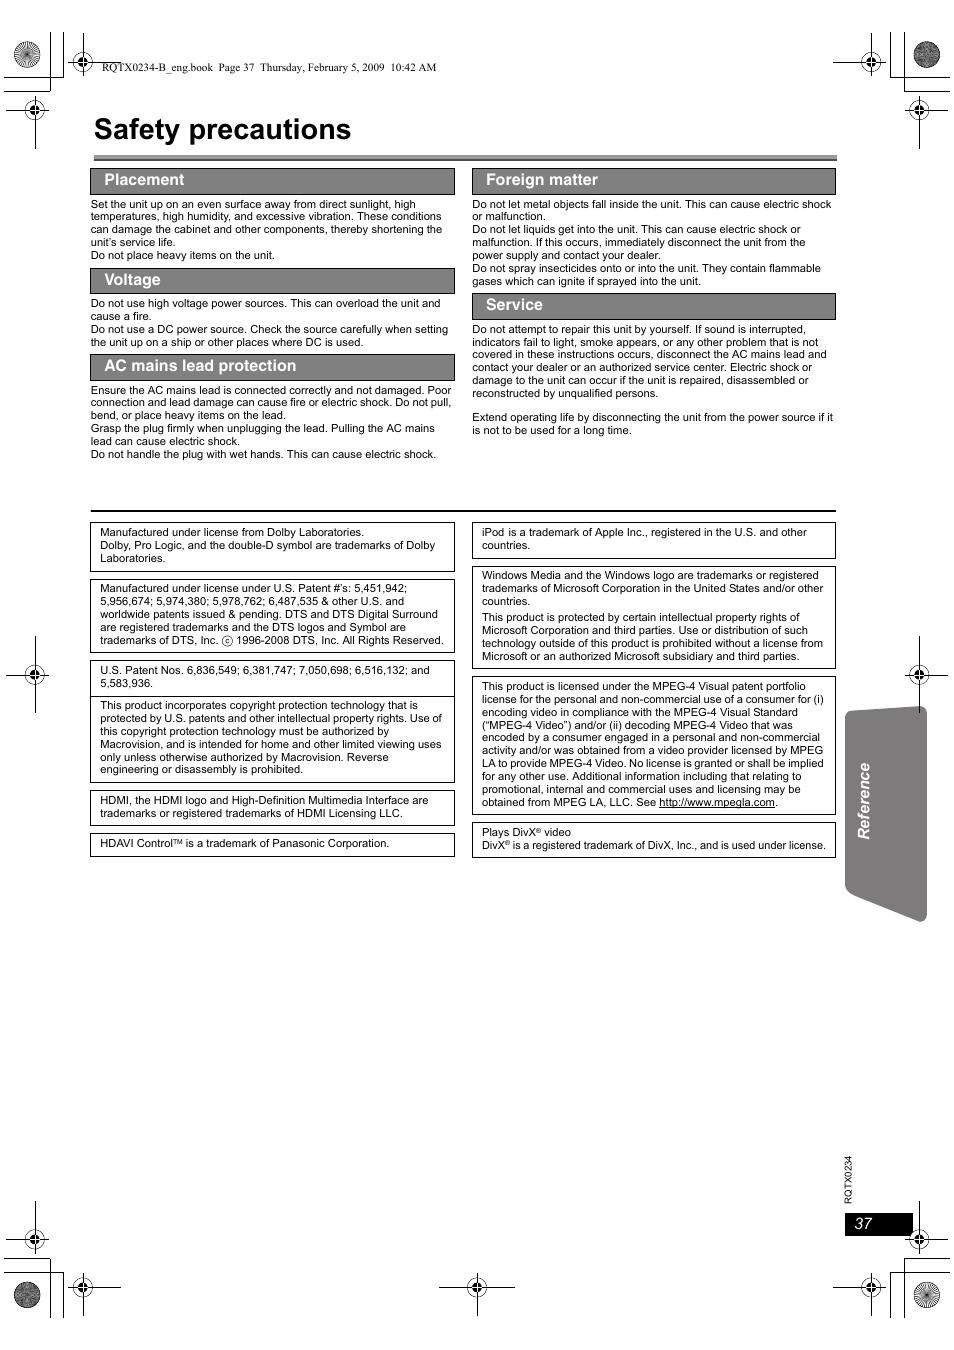 safety precautions panasonic sc pt875 user manual page 37 40 rh manualsdir com Apple iPad User Guide Manual Apple.com Support